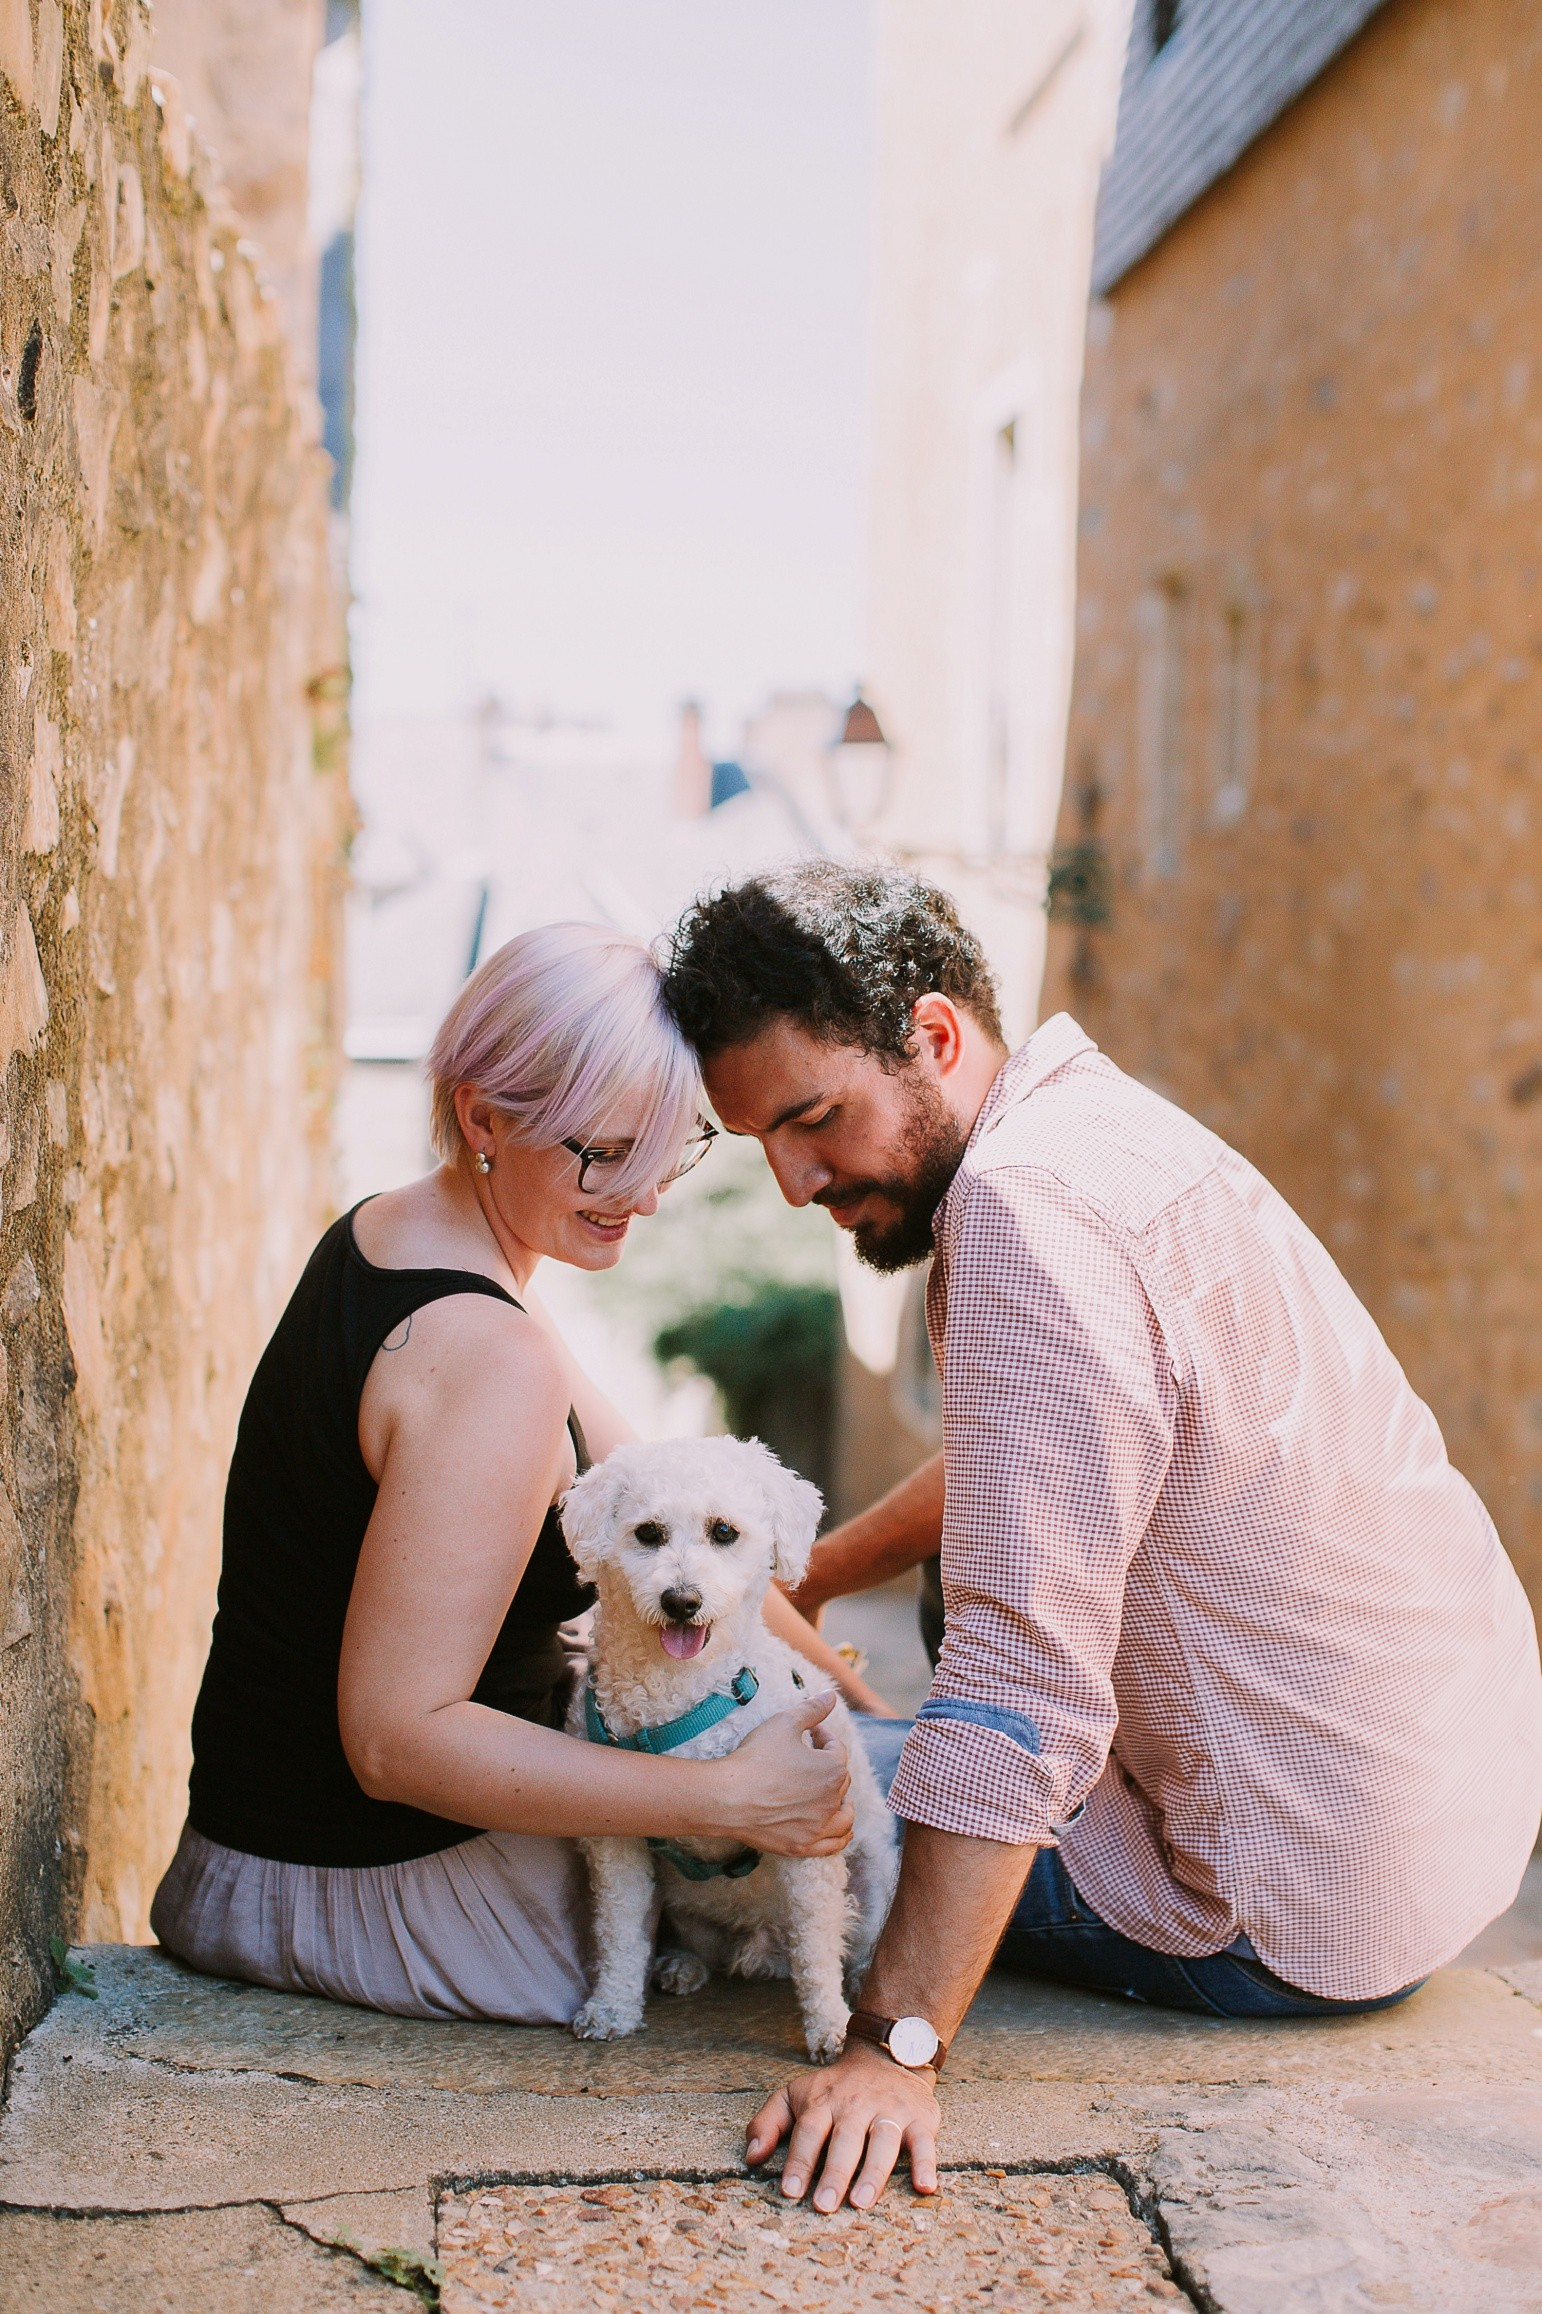 kateryna-photos-mariage-photographe-pornic-bretagne-nantes-couple-engagement-love-story-le-mans-wedding_0202.jpg